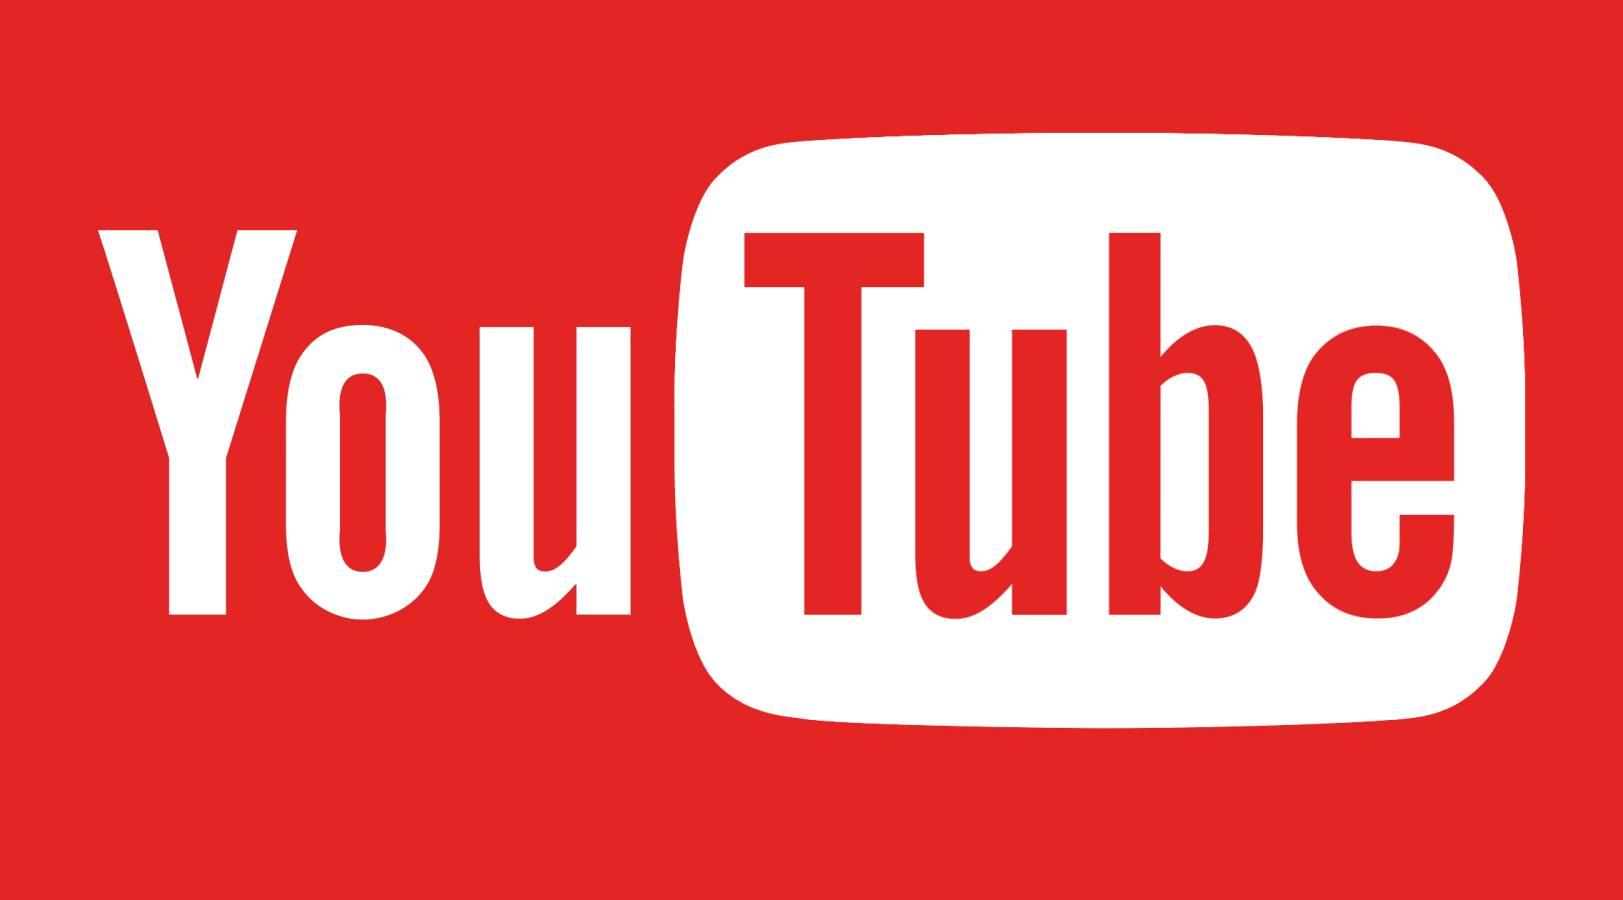 YouTube schimbari design